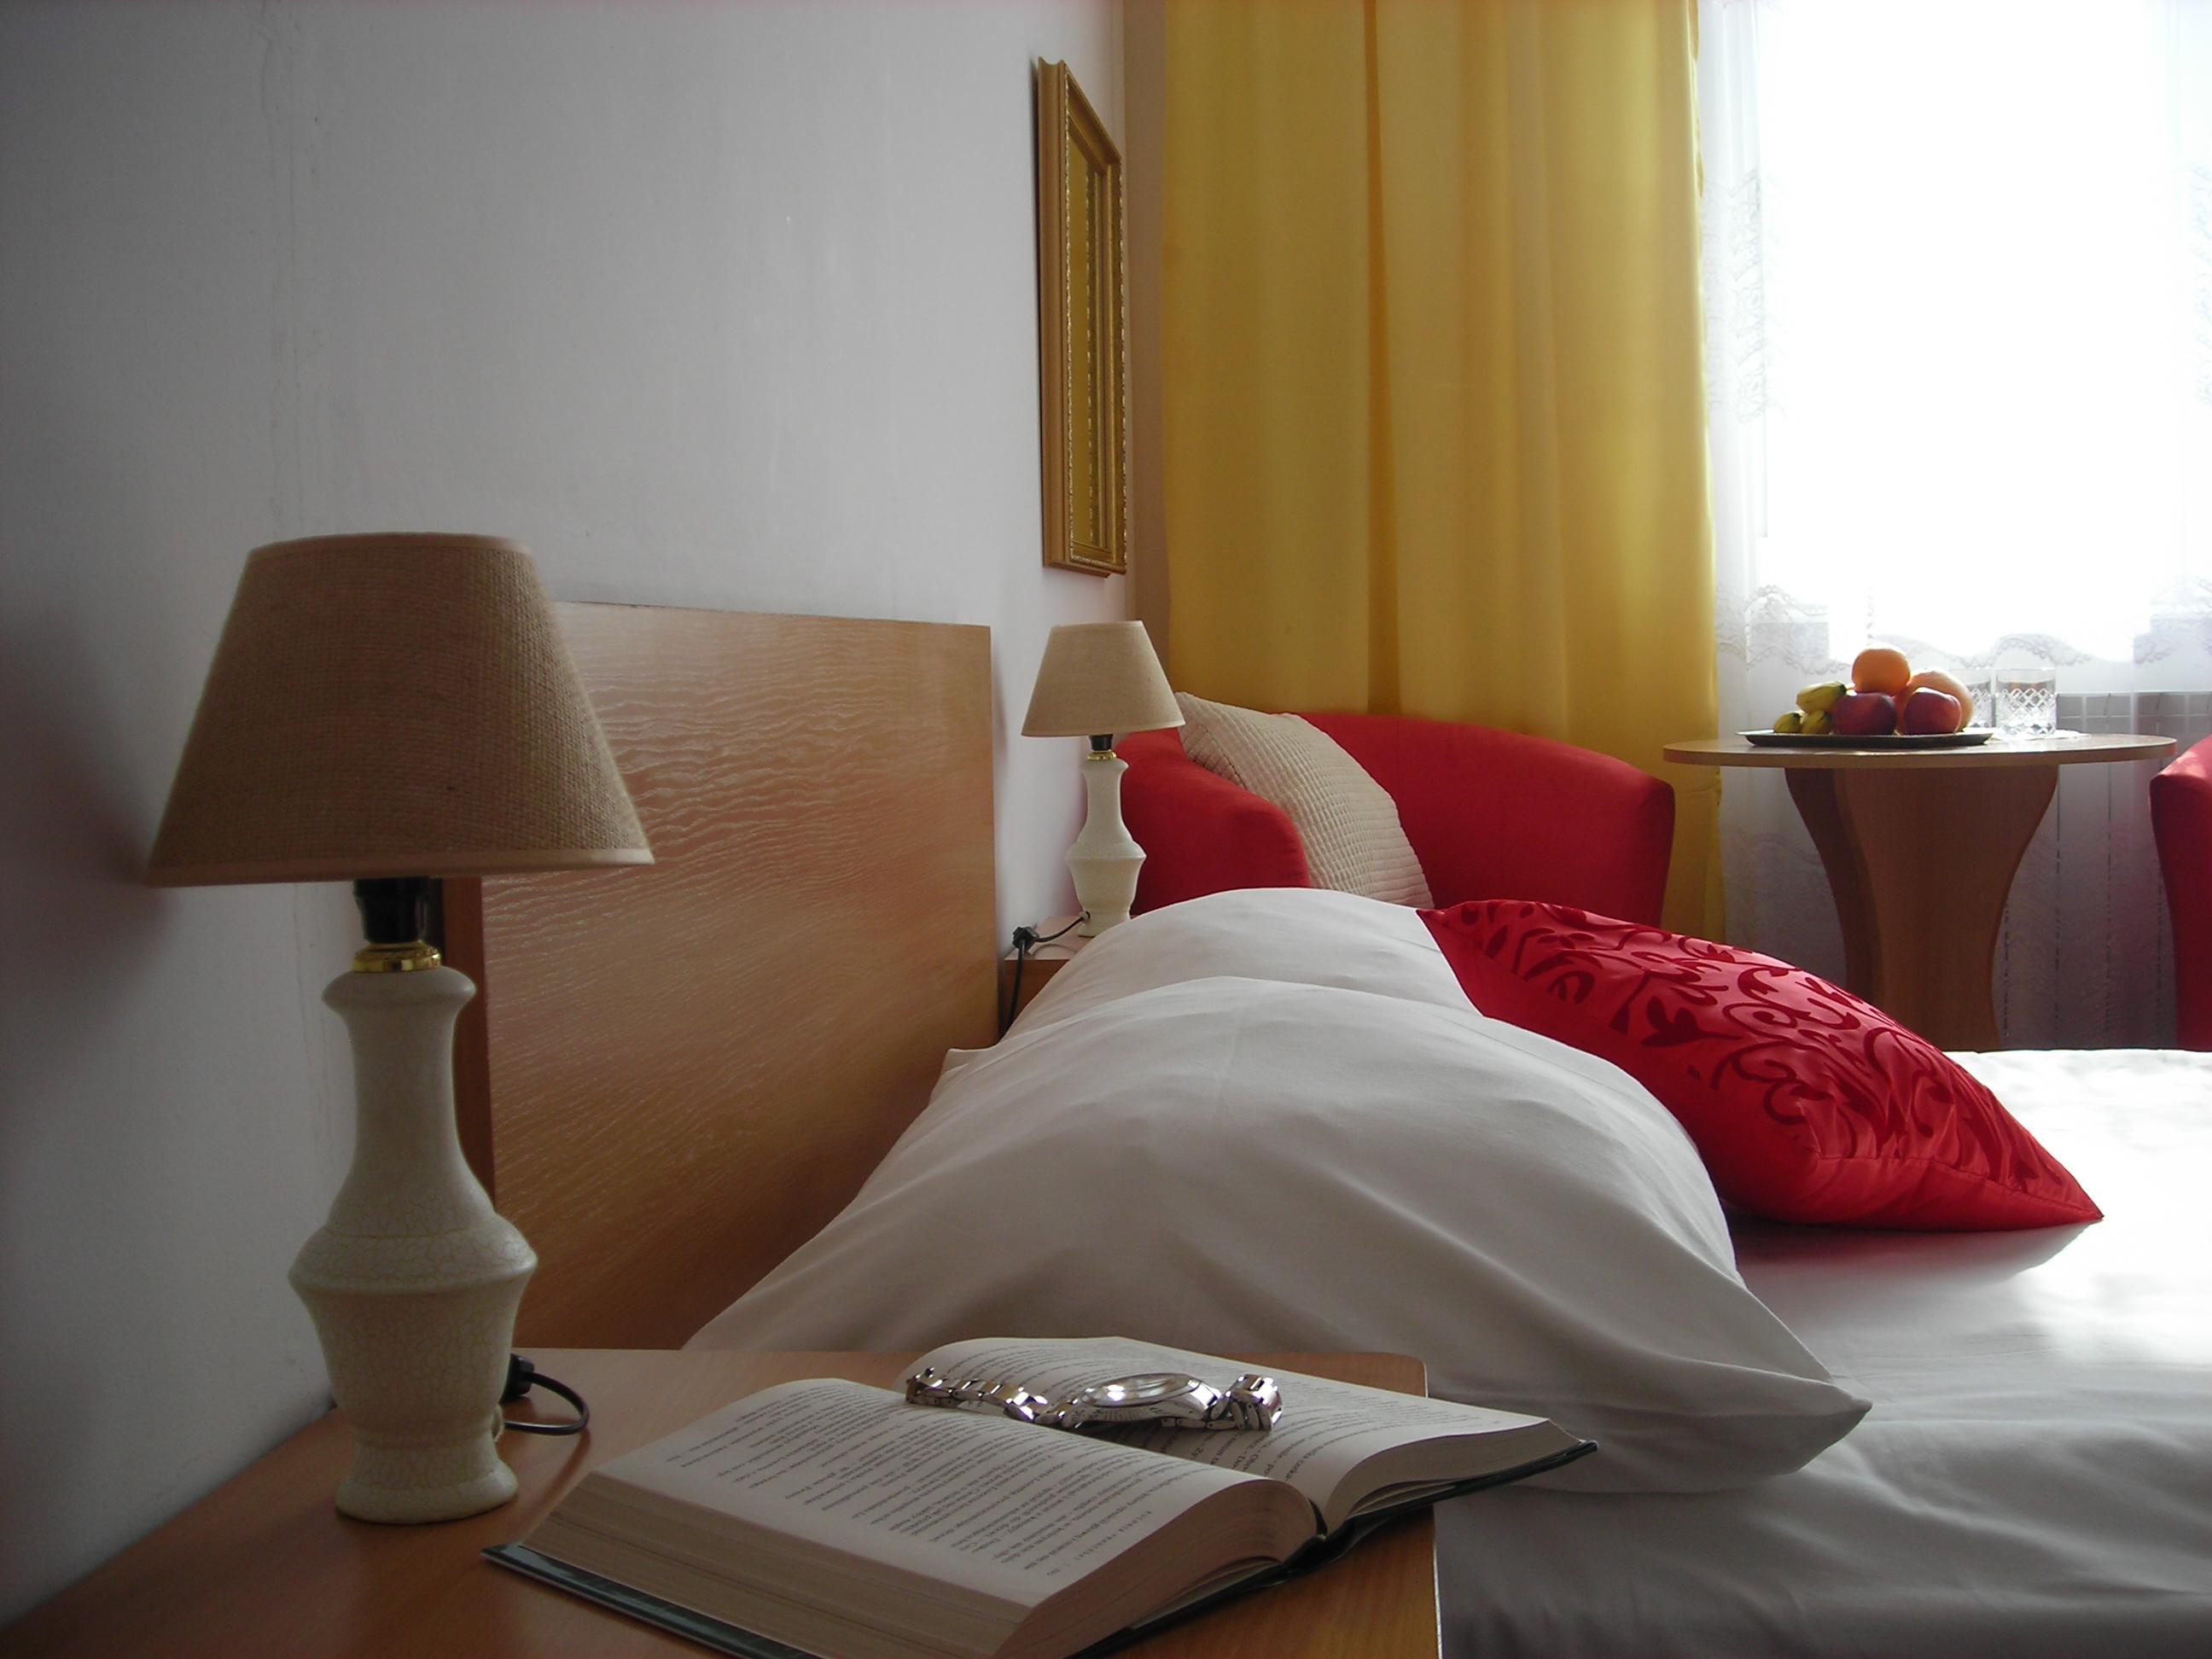 http://eng.hotelas.pl/wp-content/uploads/2017/11/hotel_biala_podlaska_pokoj_dwuosobowy_apartament.jpg